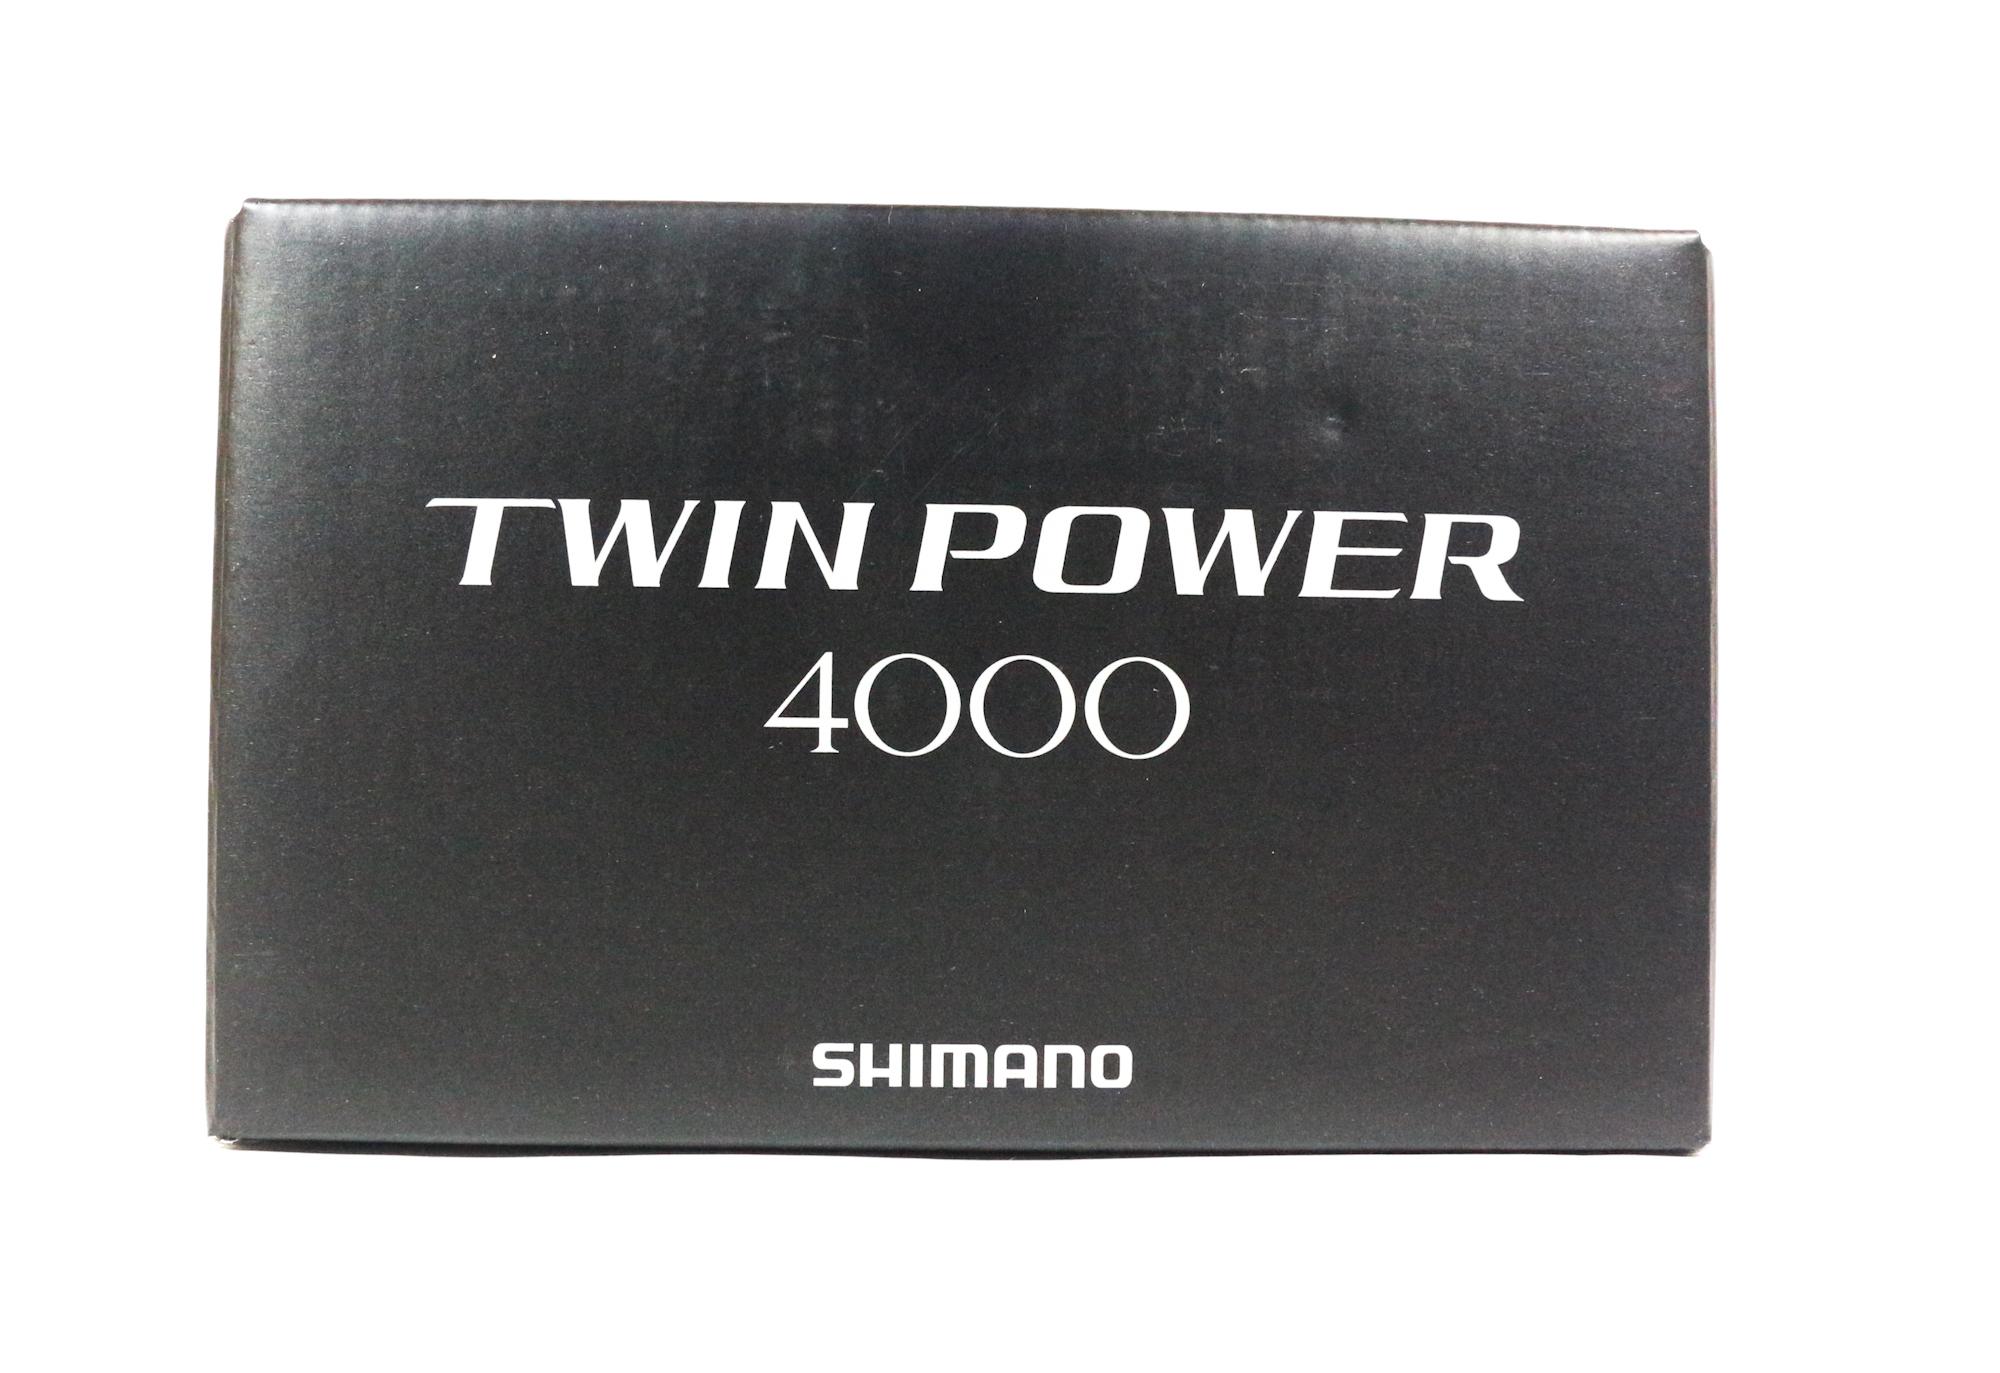 Shimano Reel Spinning Twinpower FD 4000 2020 (2309)